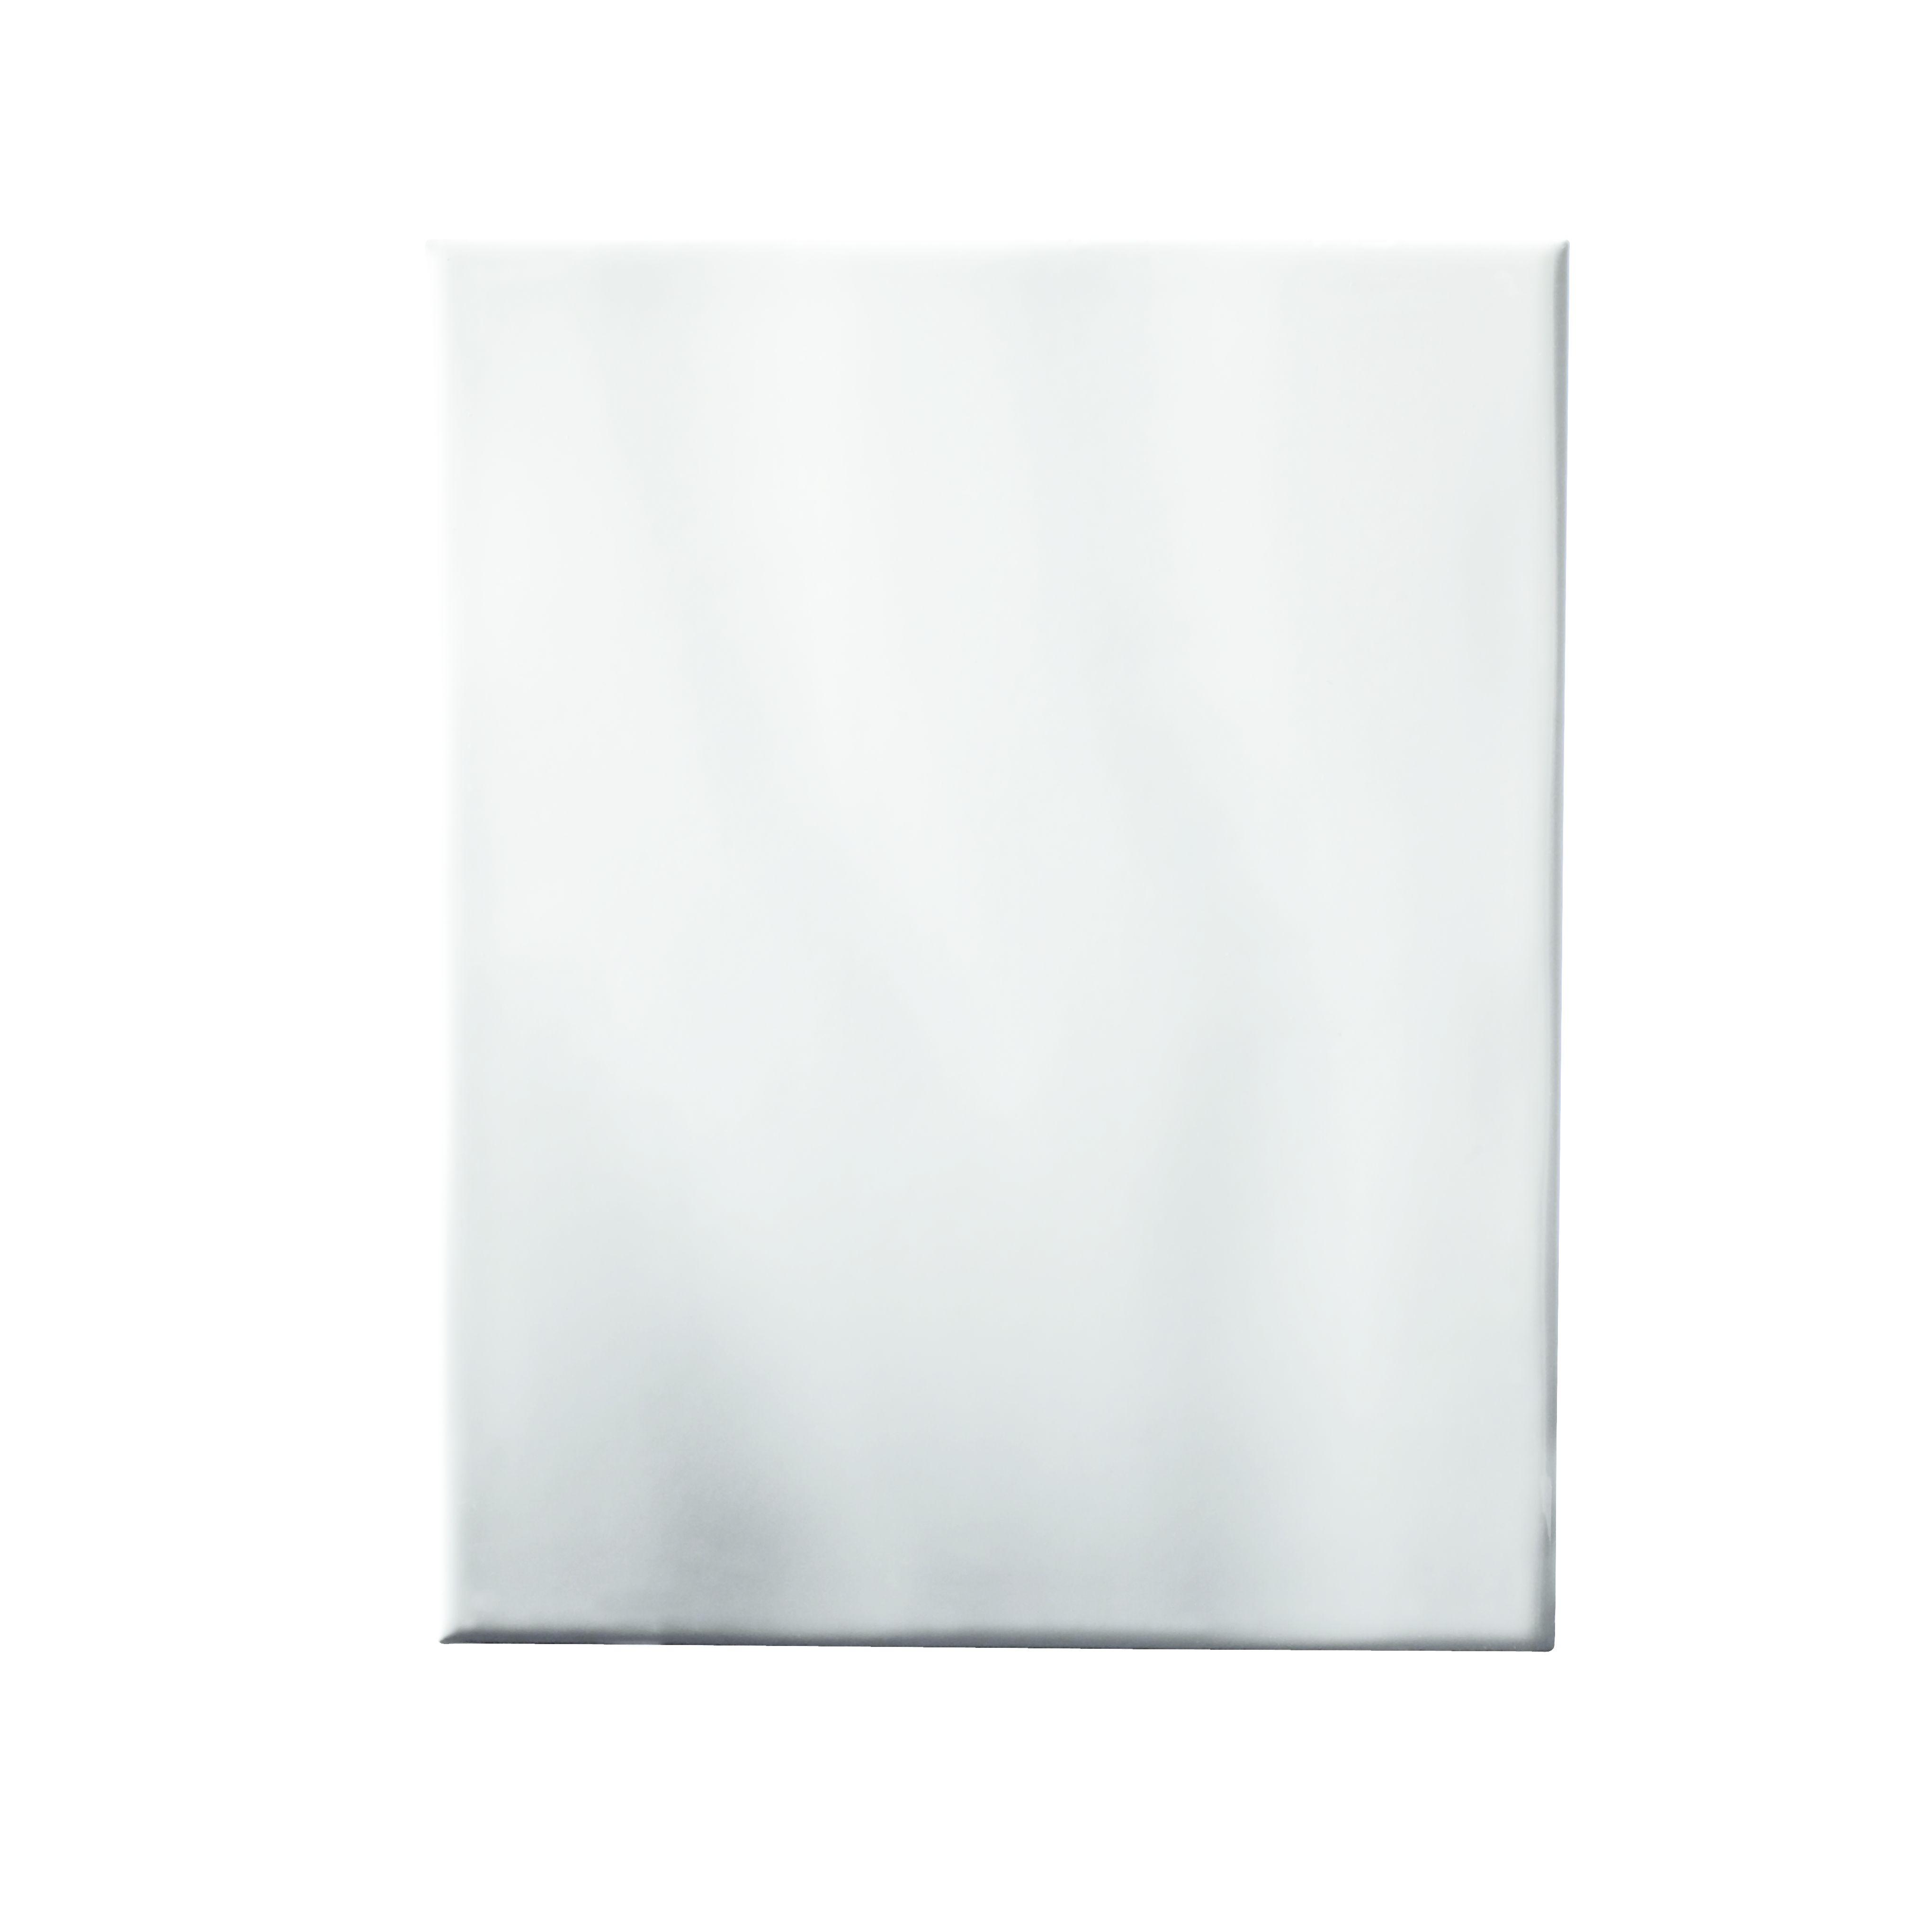 Holborn White Ceramic Wall Tile Pack Of 20 L 250mm W: White Gloss Ripple Ceramic Wall Tile, Pack Of 20, (L)250mm